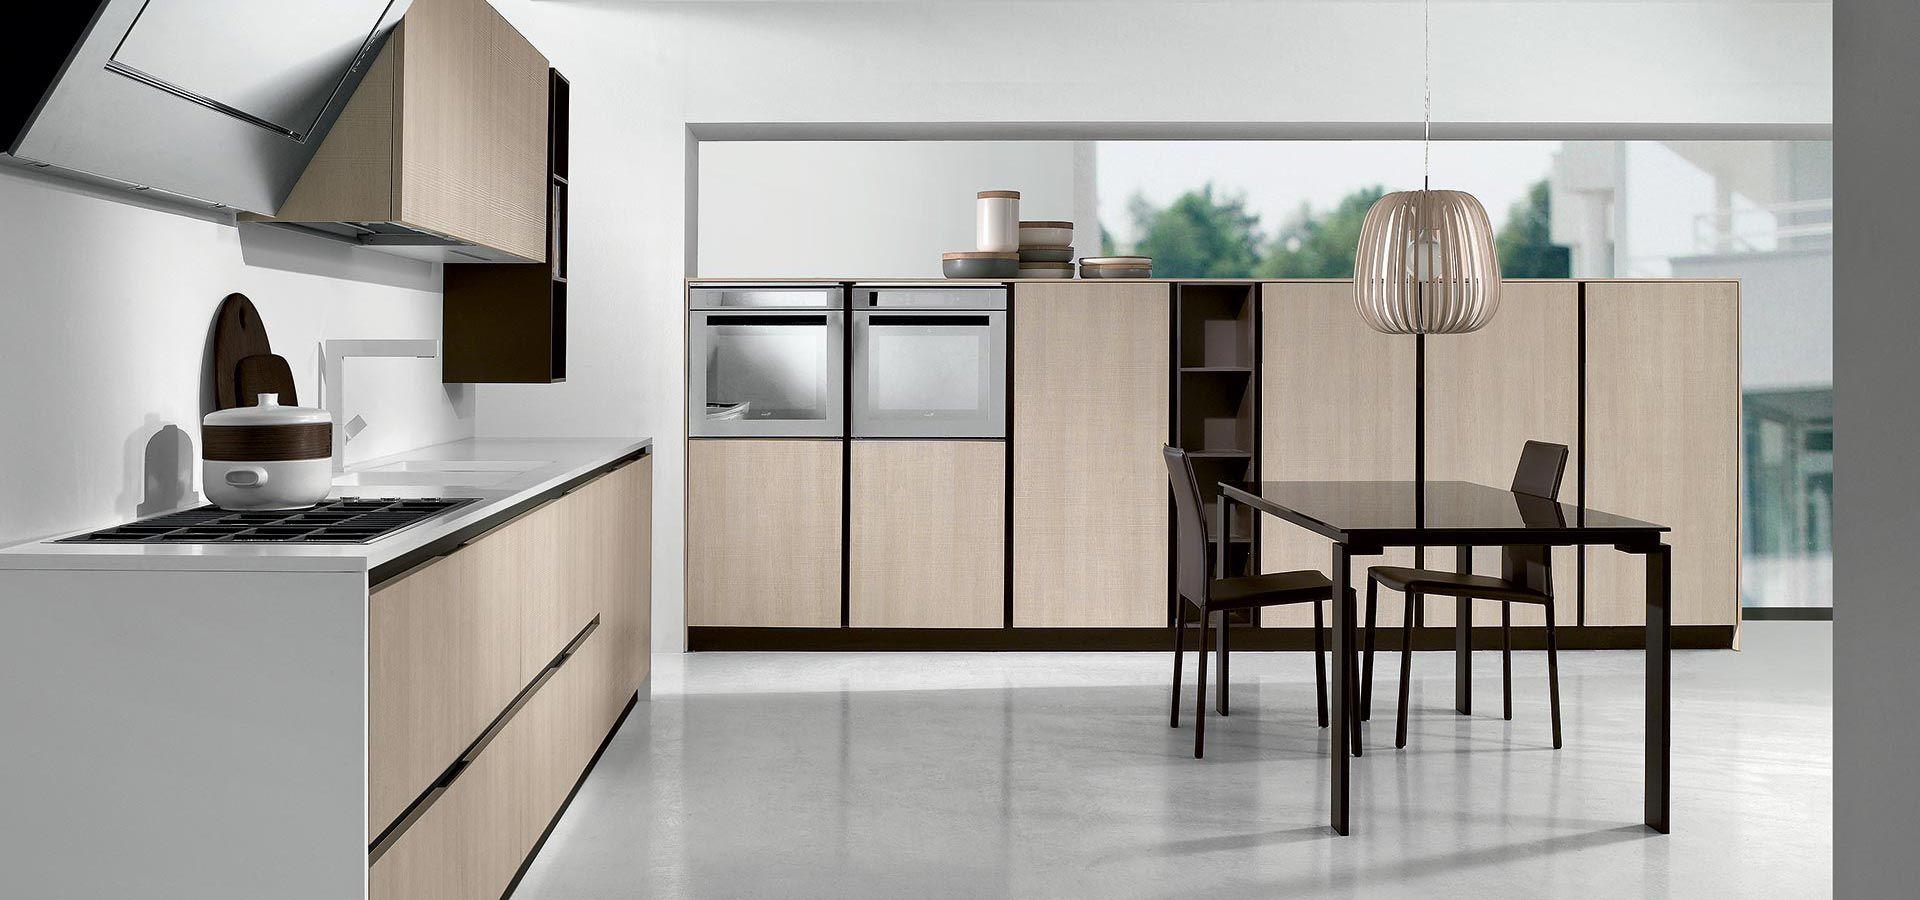 Cucina Moderna - Round Finitura tranchès rovere sabbia   Piano in ...